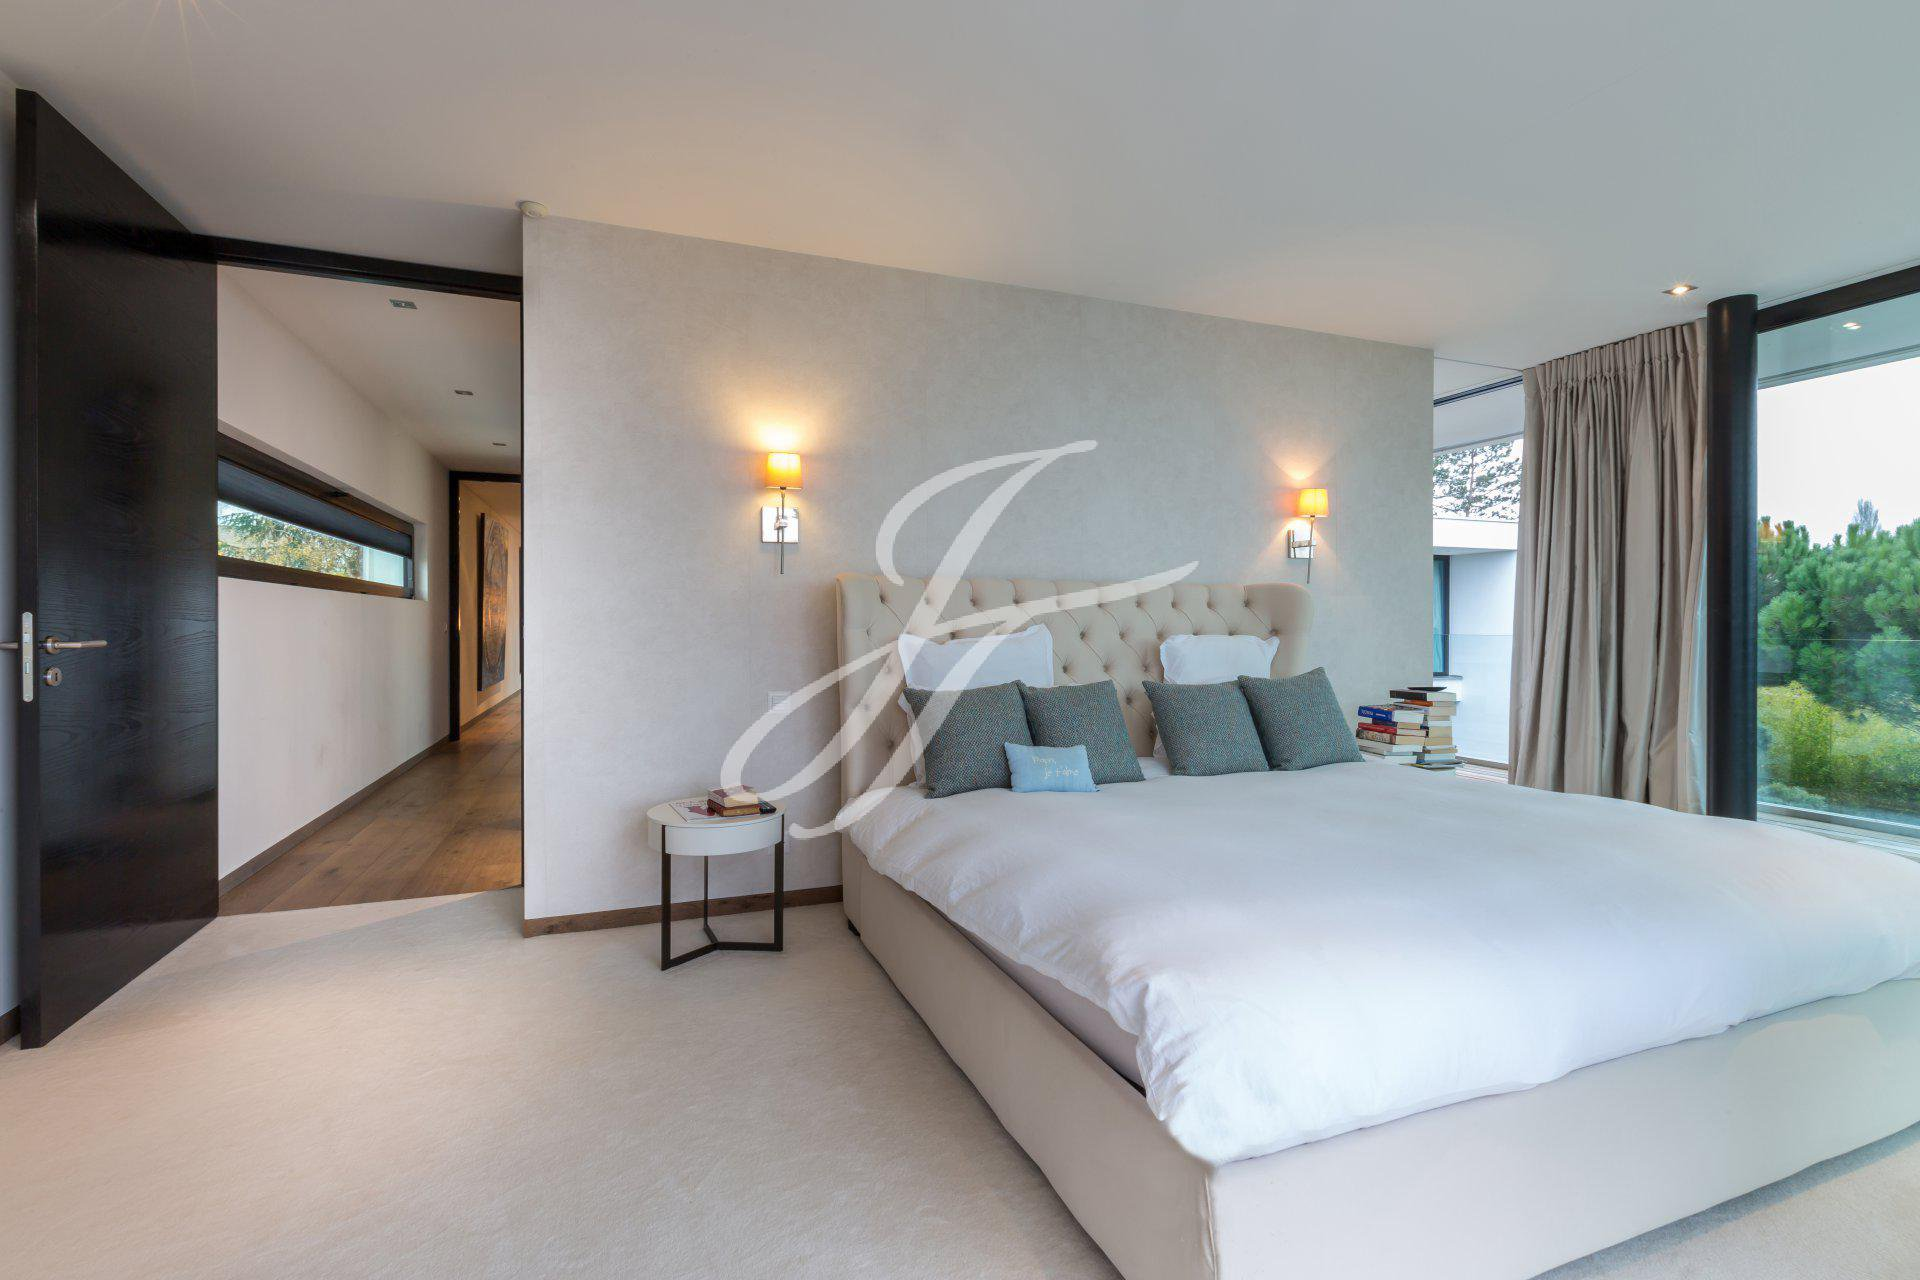 Sumptuous villa for sale in Anières, Switzerland |FINEST RESIDENCES